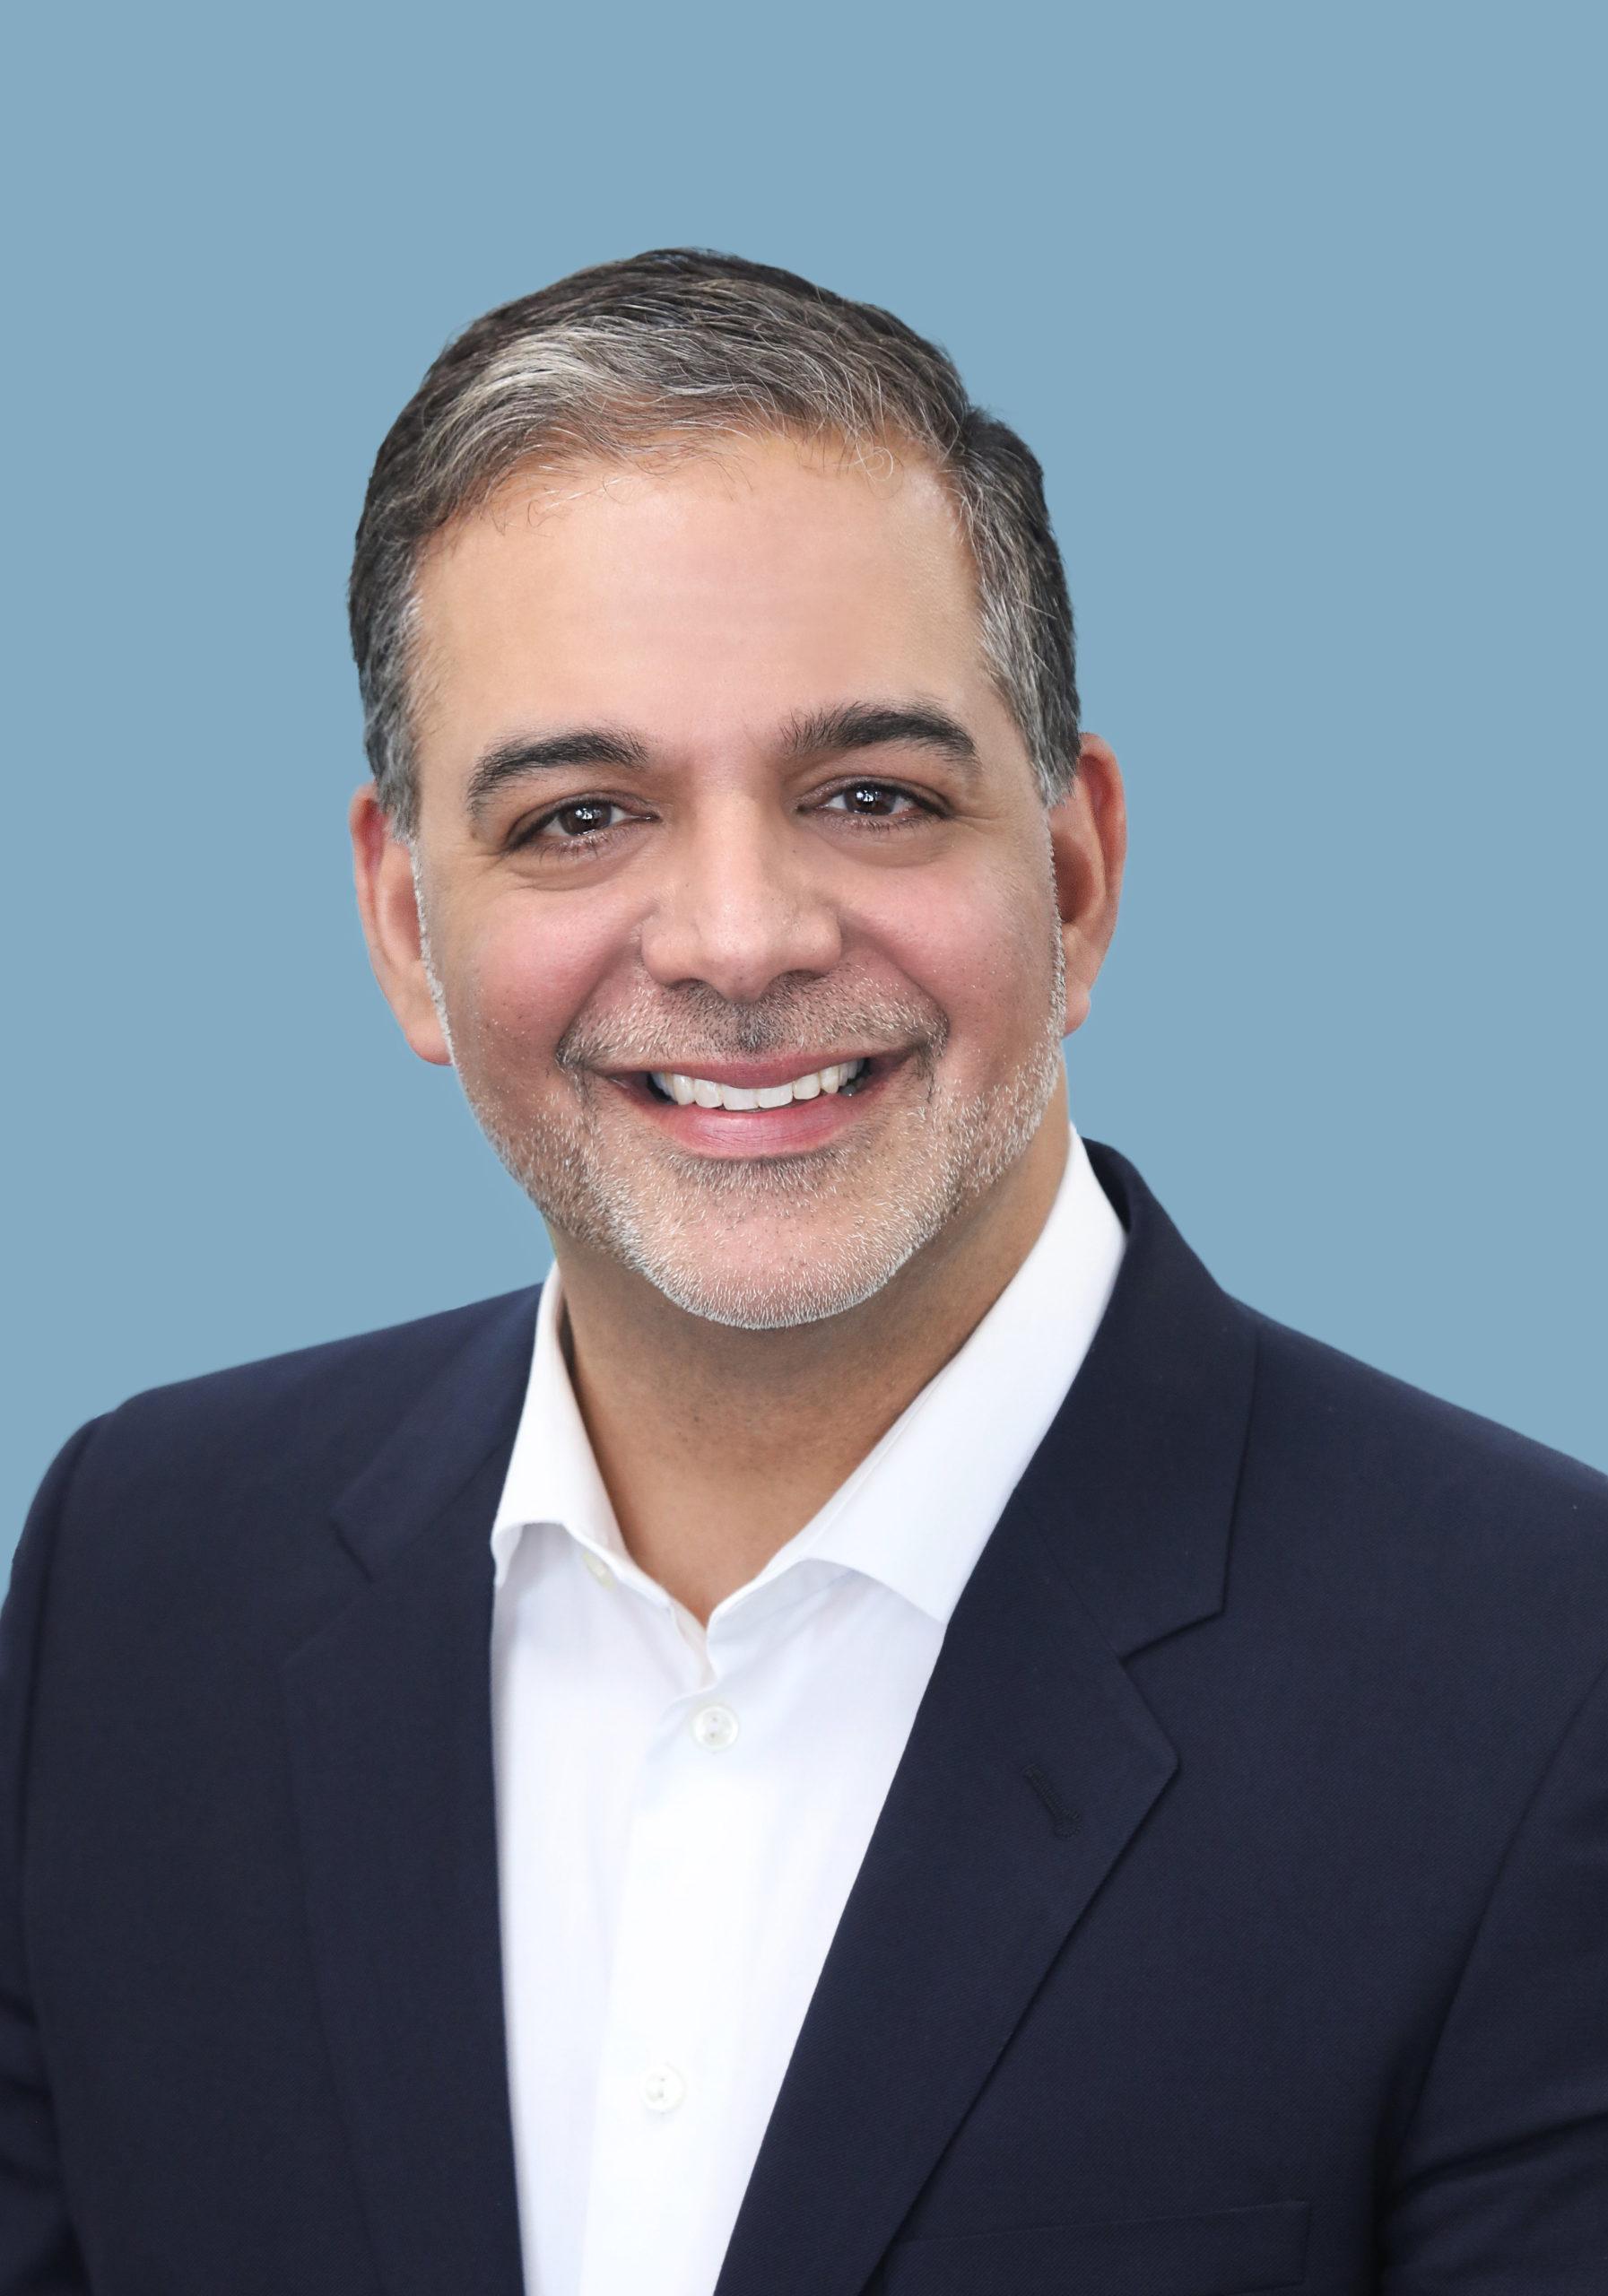 Amit K. Sachdev, JD